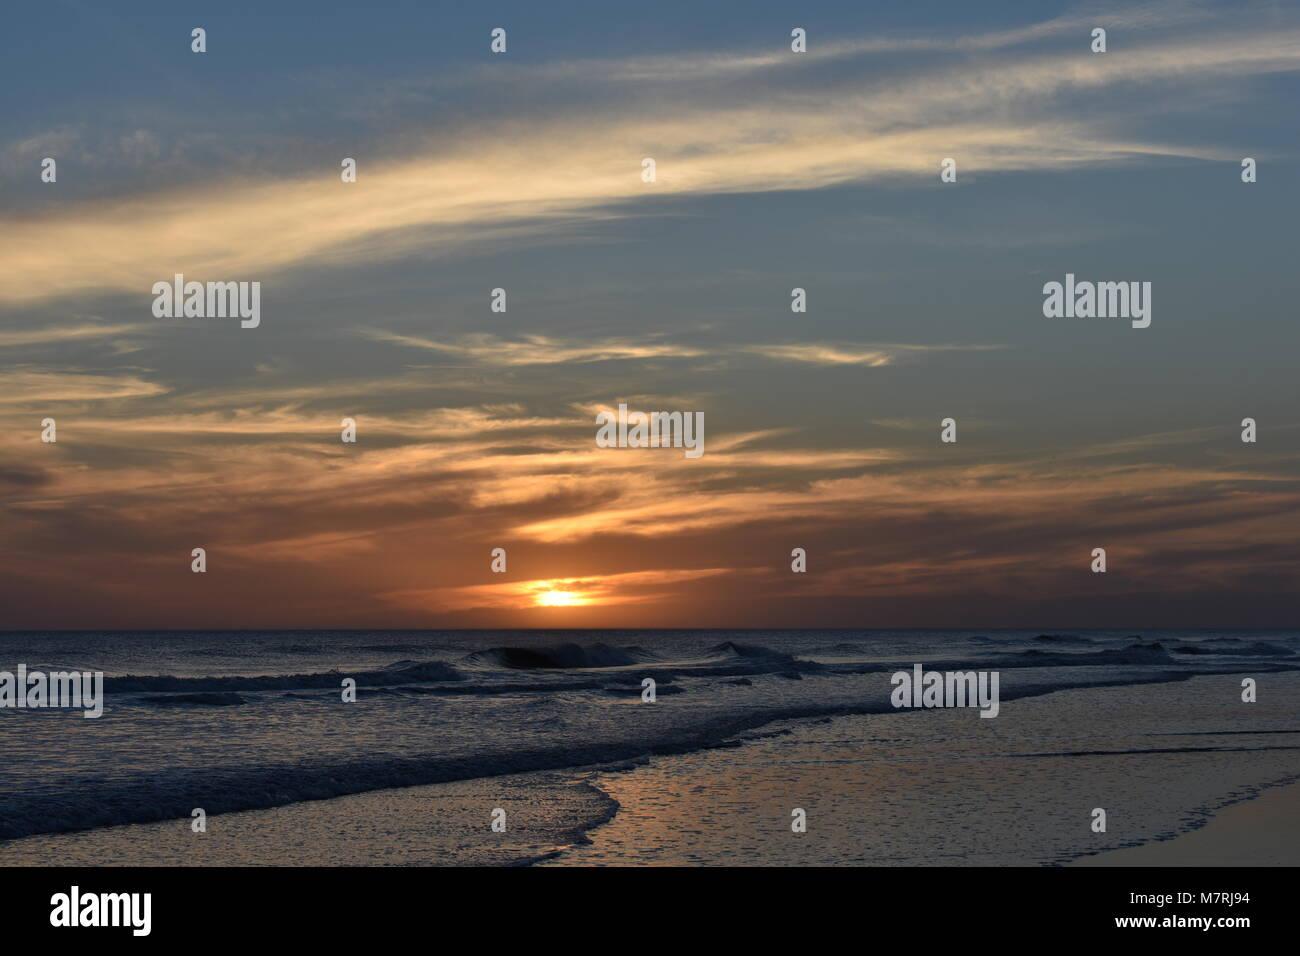 sunset in the sea atlantic - Stock Image